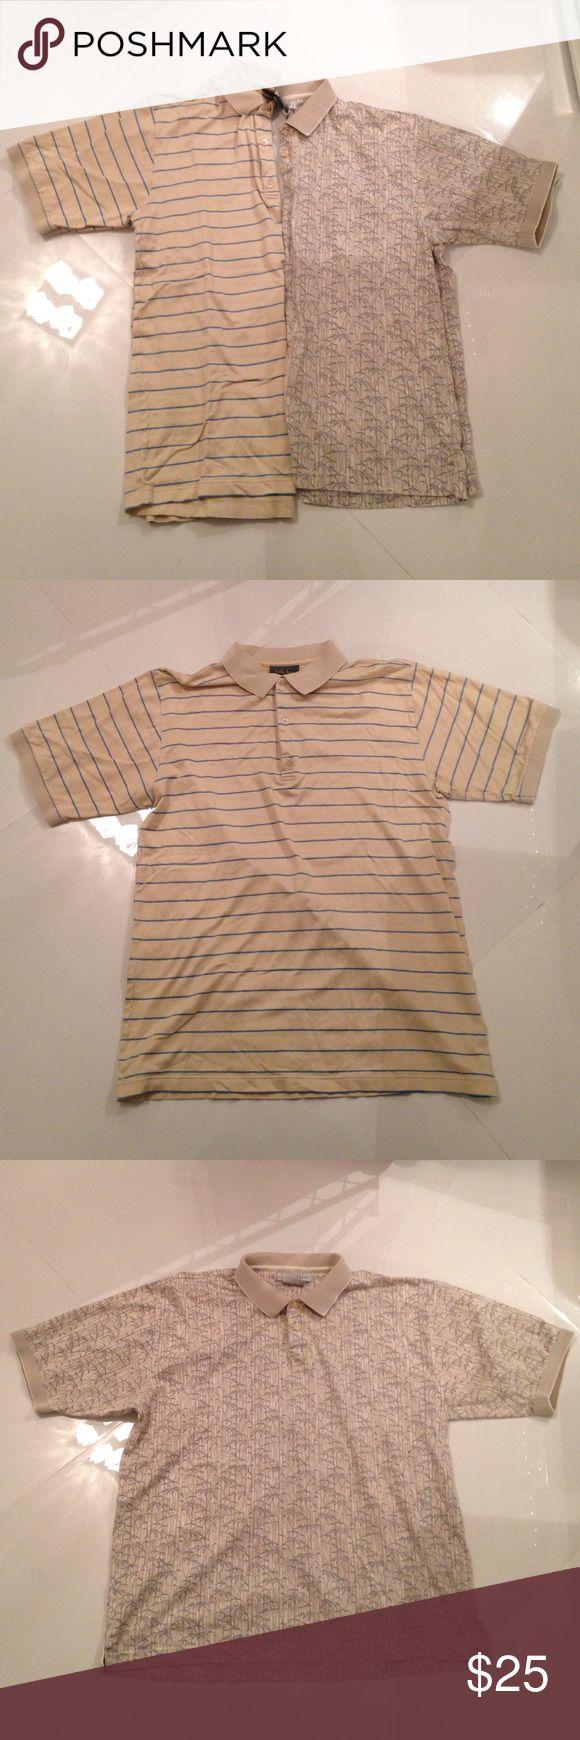 💎Short sleeve polo shirt bundle Tan and blue shirt by Bobby Jones Collection and tan palm tree print shirt by Geoffrey Beene. $10 each Geoffrey Beene Shirts Polos